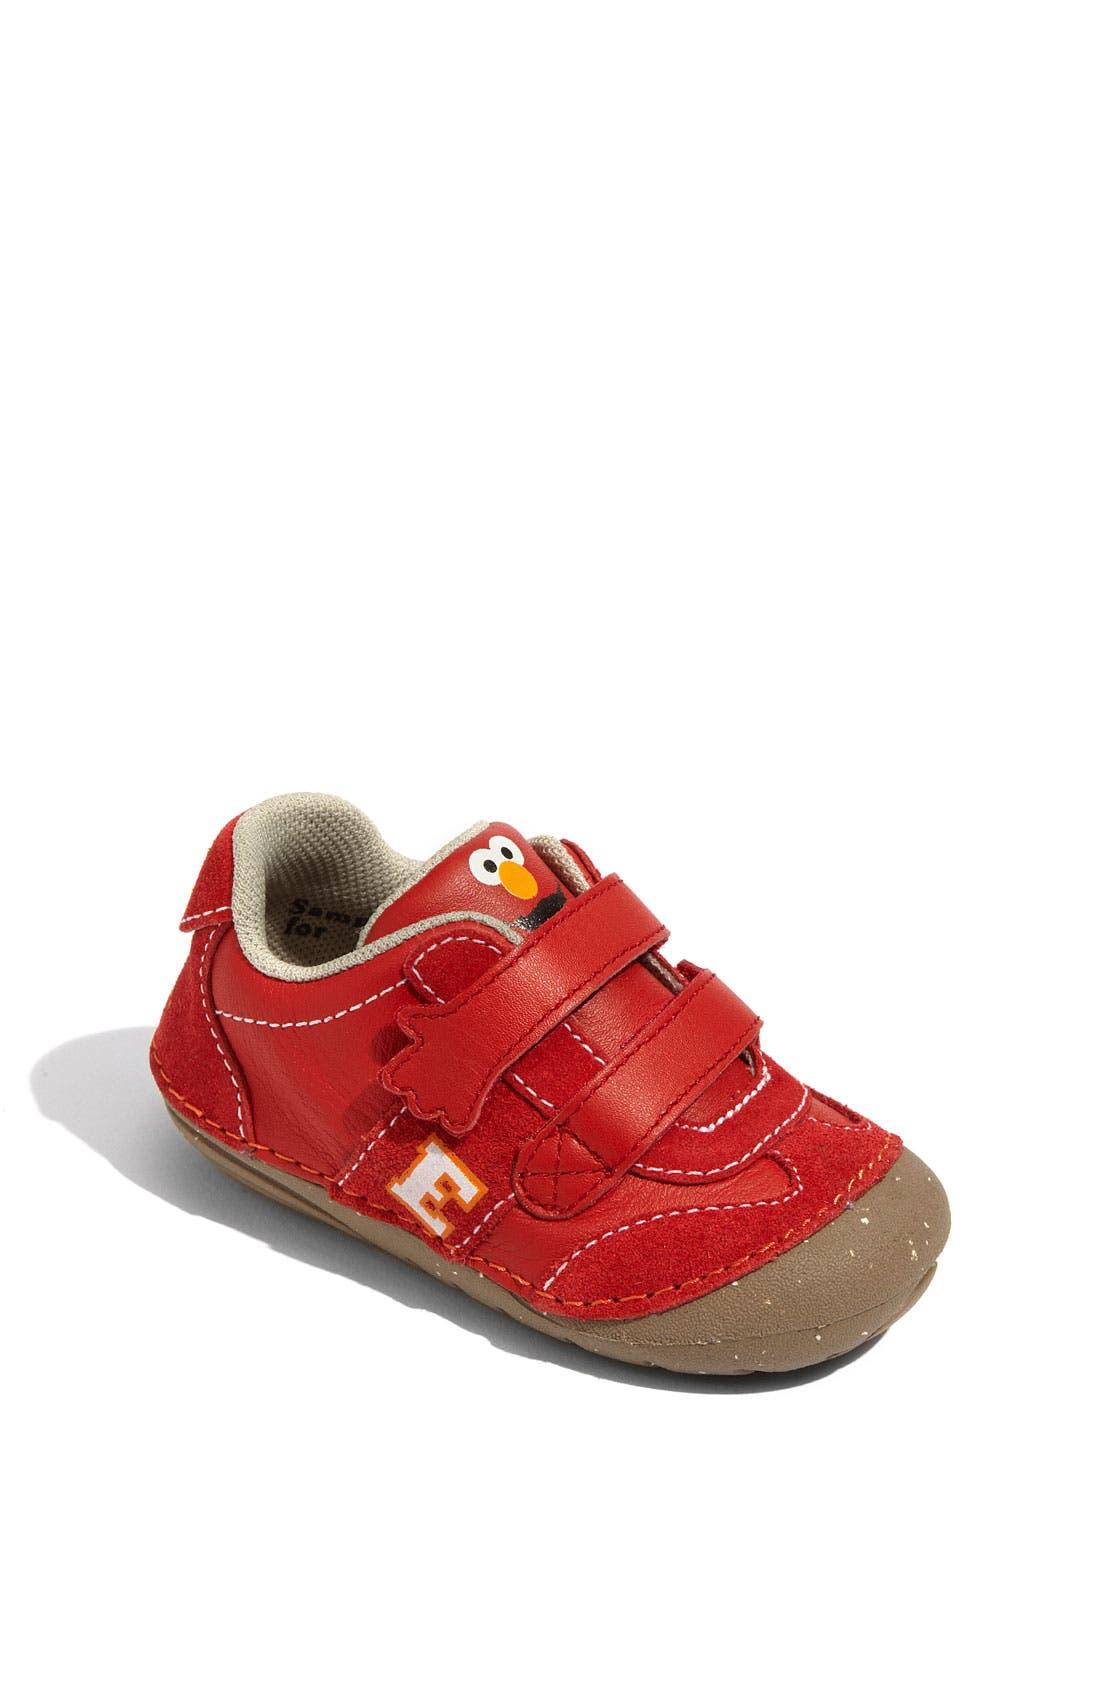 'Sesame Street<sup>®</sup> - Elmo' Sneaker, Main, color, 600